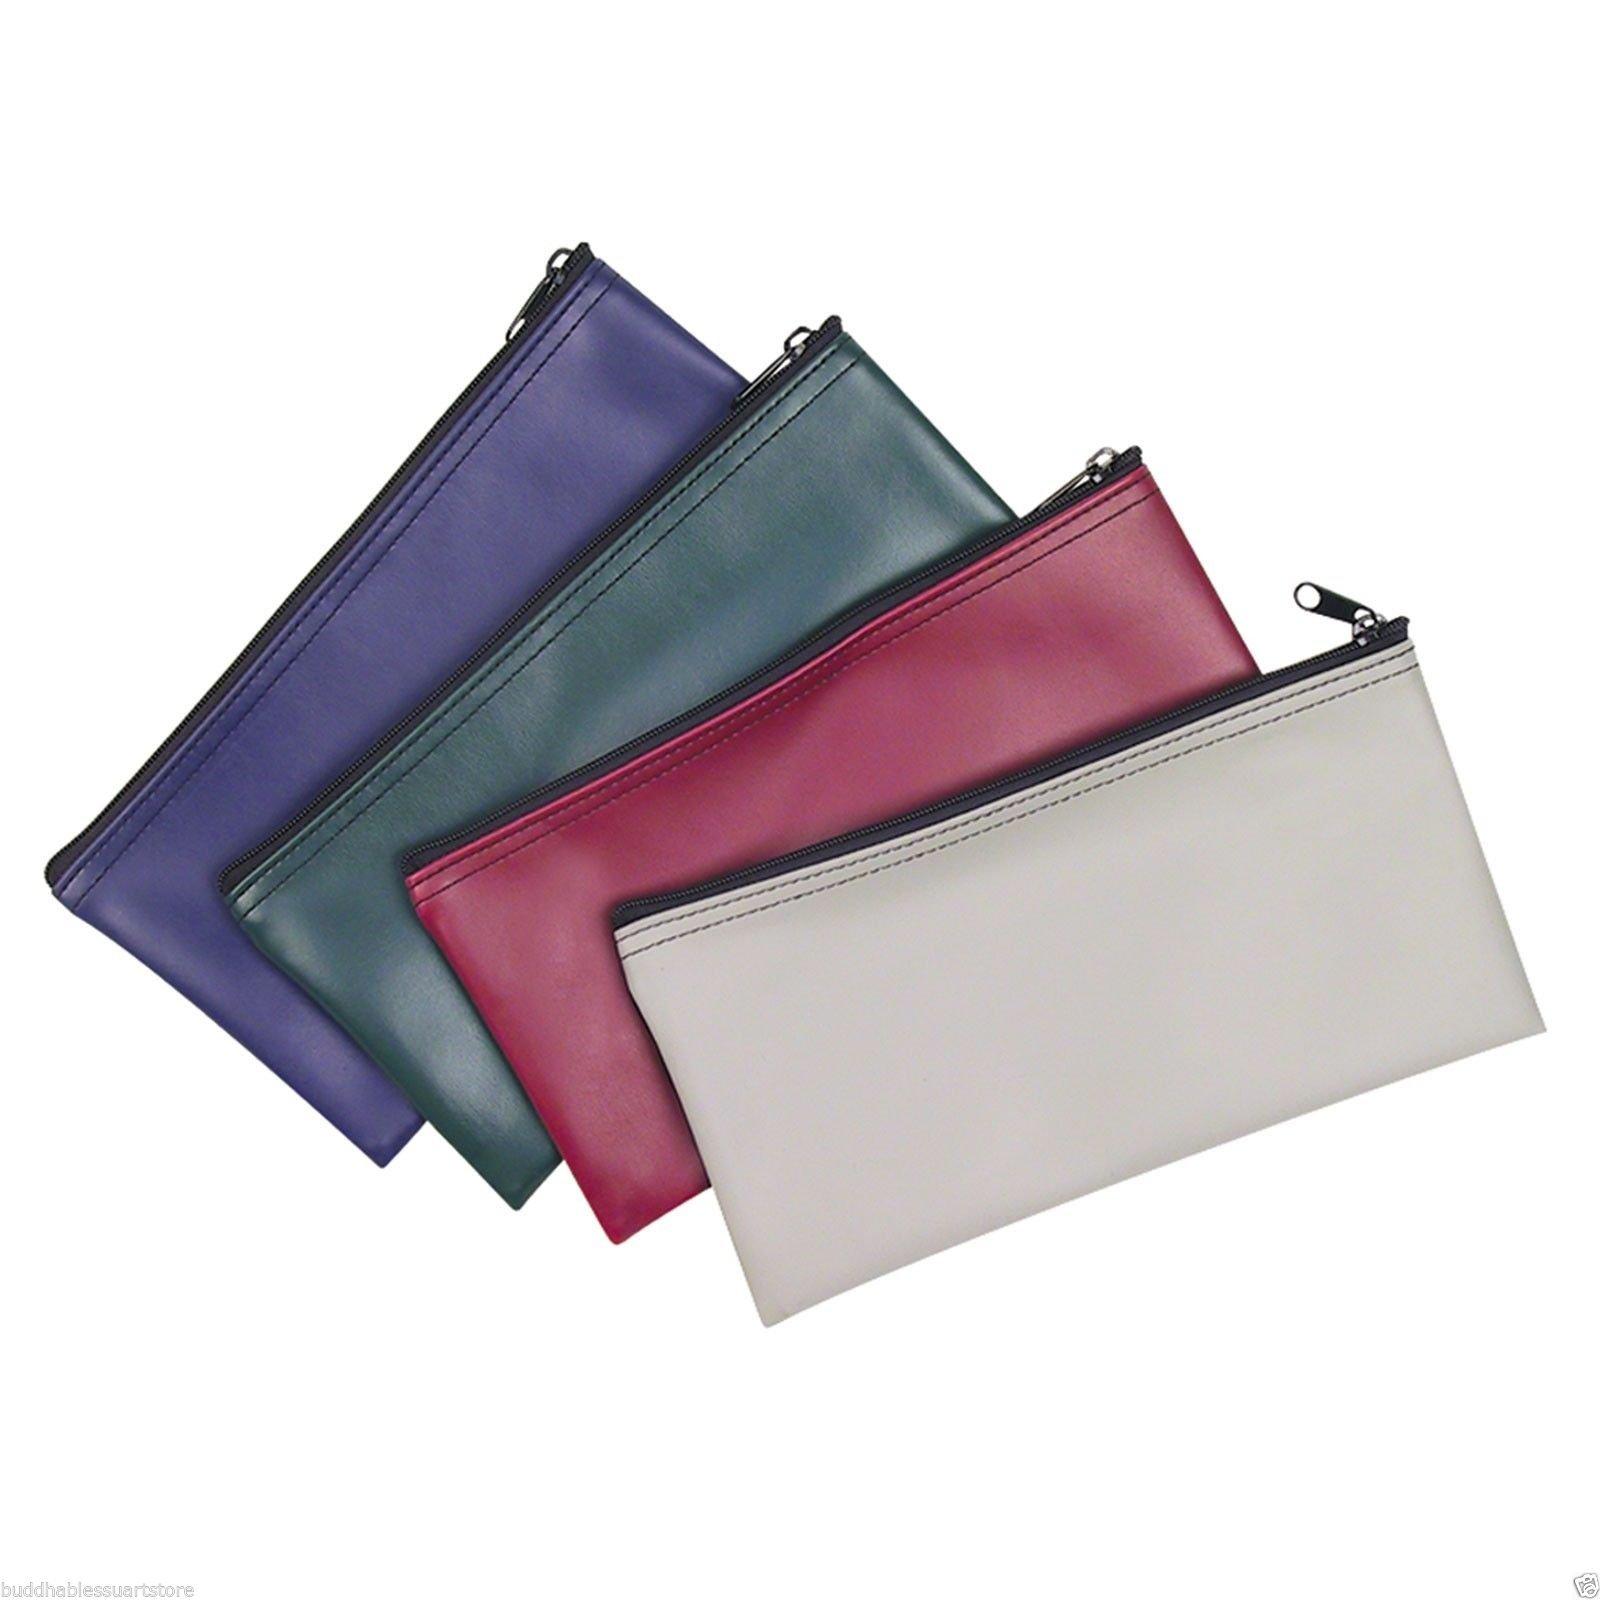 ProEquip 4 Piece Set PM Company Security Bank Deposit Bag/Utility Zipper Coin Bag/Pouch Safe Money Organizer Bag/11 X 5.5 Inches (FREE RETURN) (4 Envelope - 1 of Each Color)